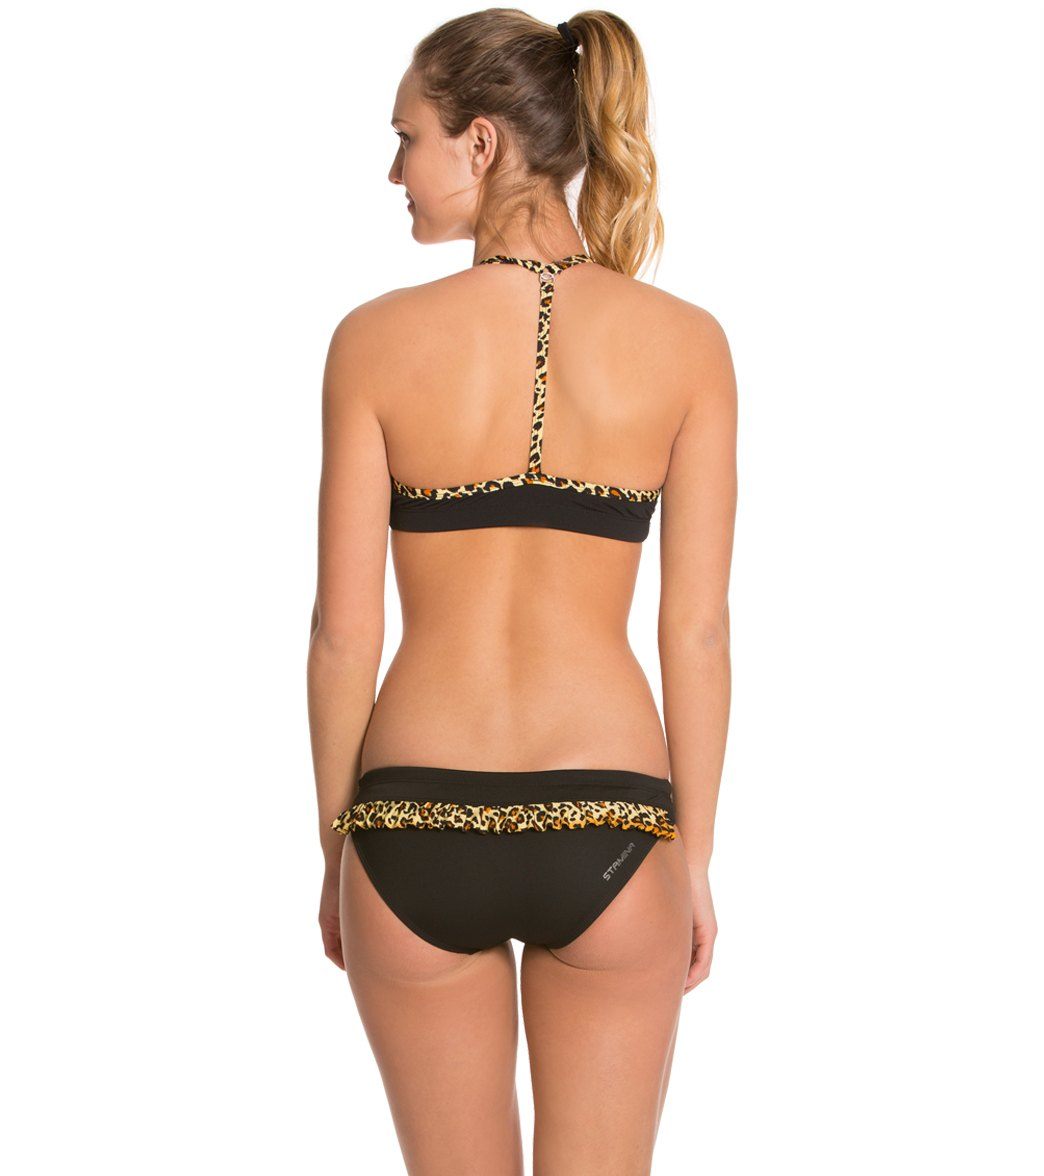 87212d77555639 Slix Australia Amazon Women's I-Back Swimsuit Set at SwimOutlet.com - Free  Shipping